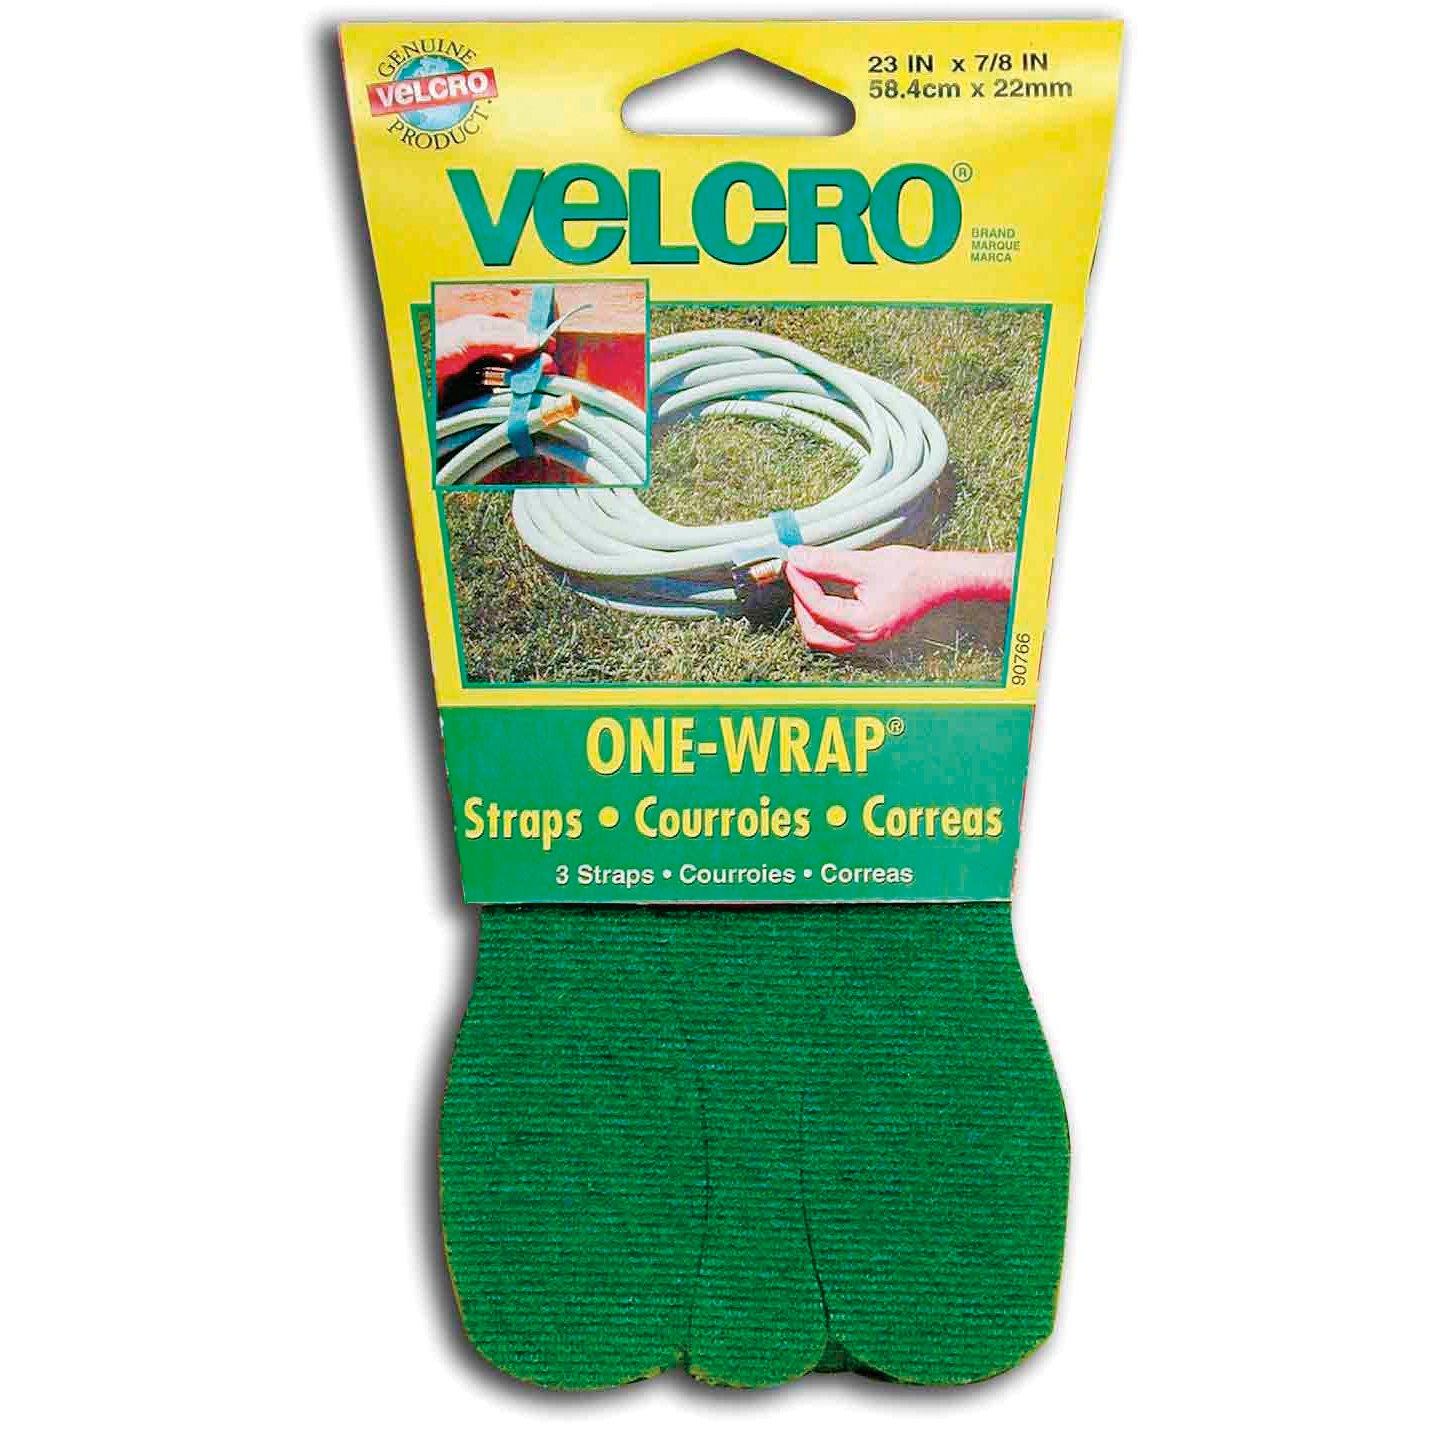 VELCRO Brand - 23 x 7/8 ONE-WRAP Straps, 3 Ct. - Green VELCRO® Brand 90766ACS